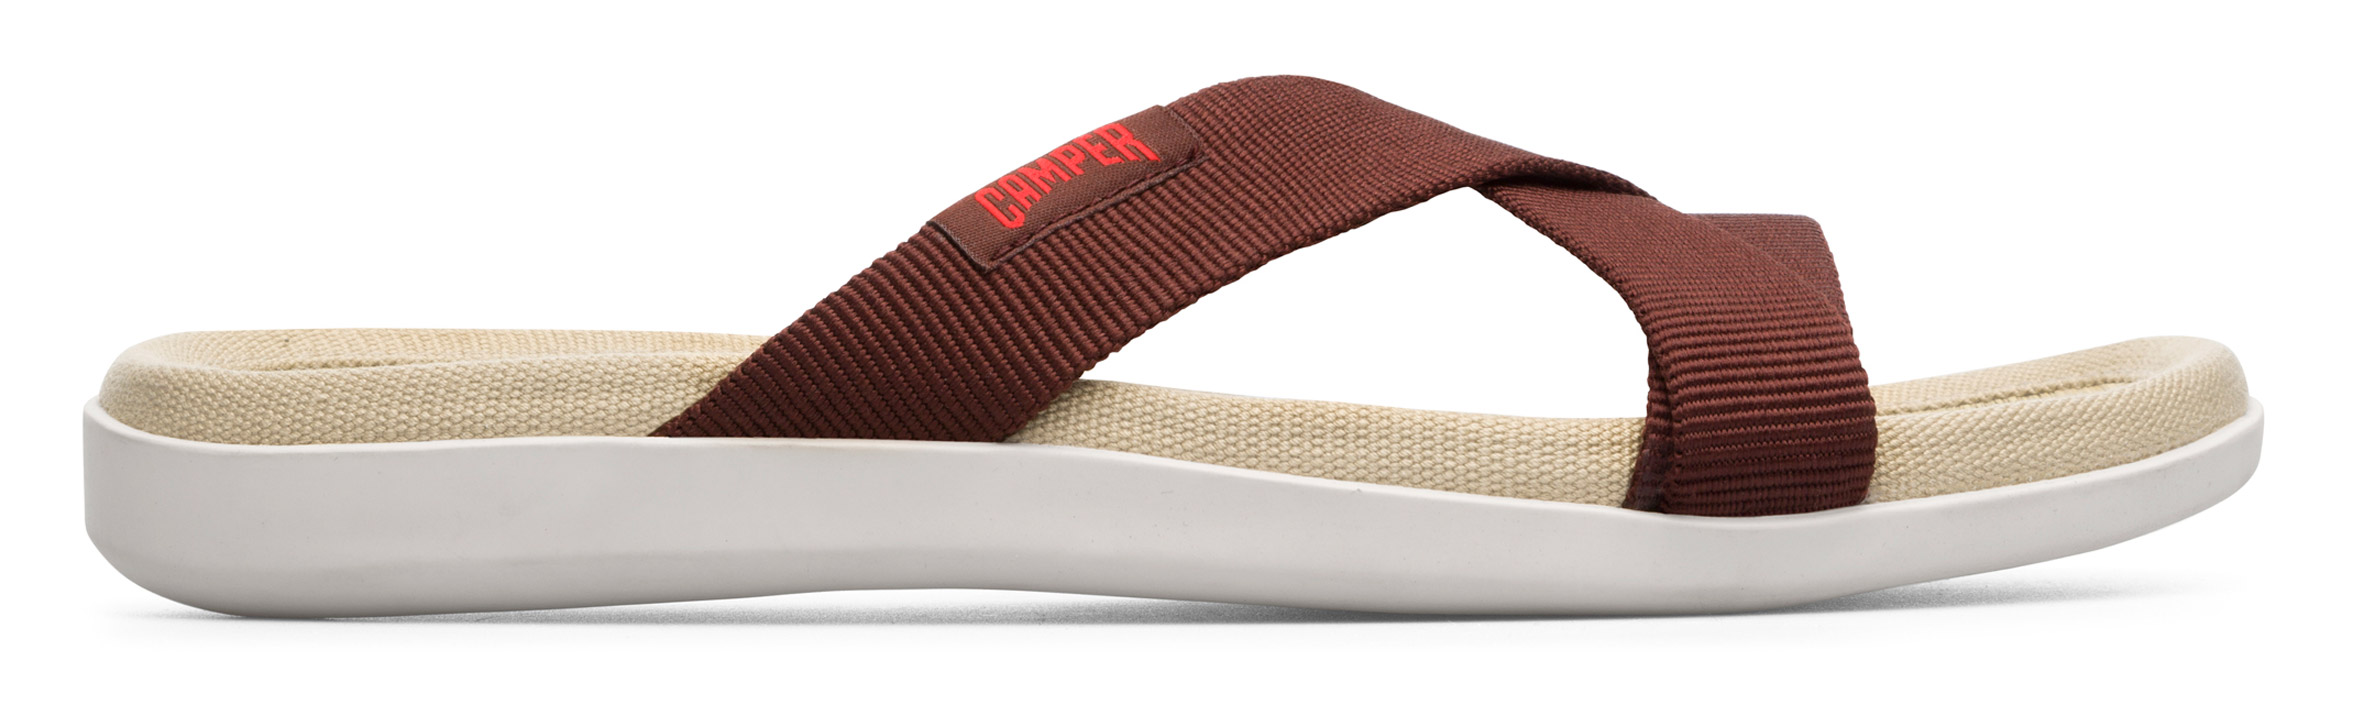 6a0972c84f8a Jasper Morrison references Japanese tatami mats for Camper sandals ...